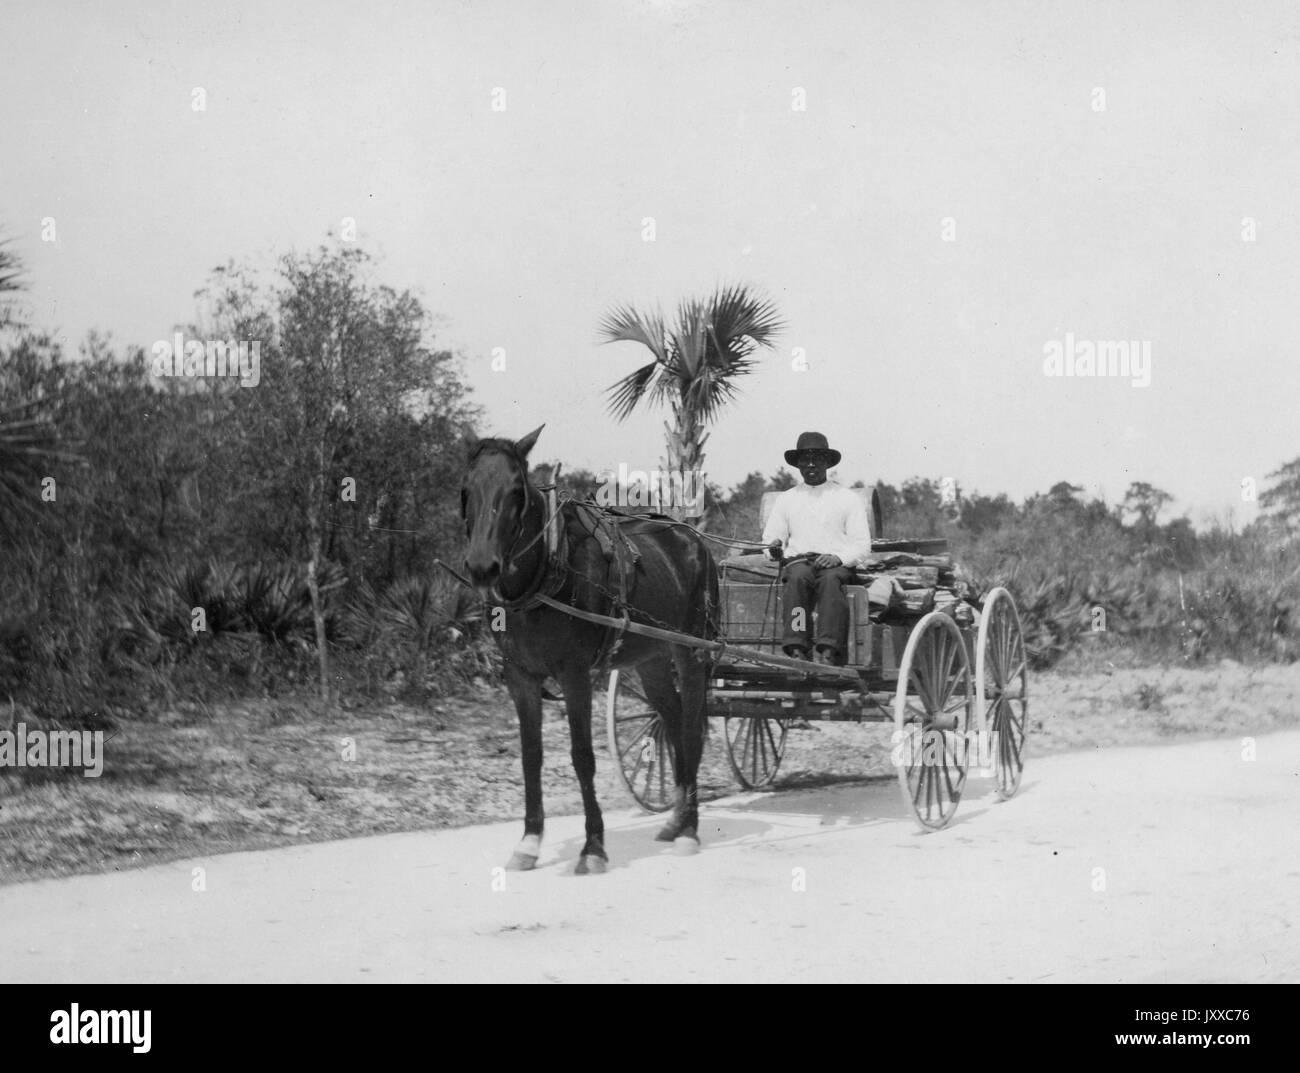 Black Man Riding Horse Stock Photos Amp Black Man Riding